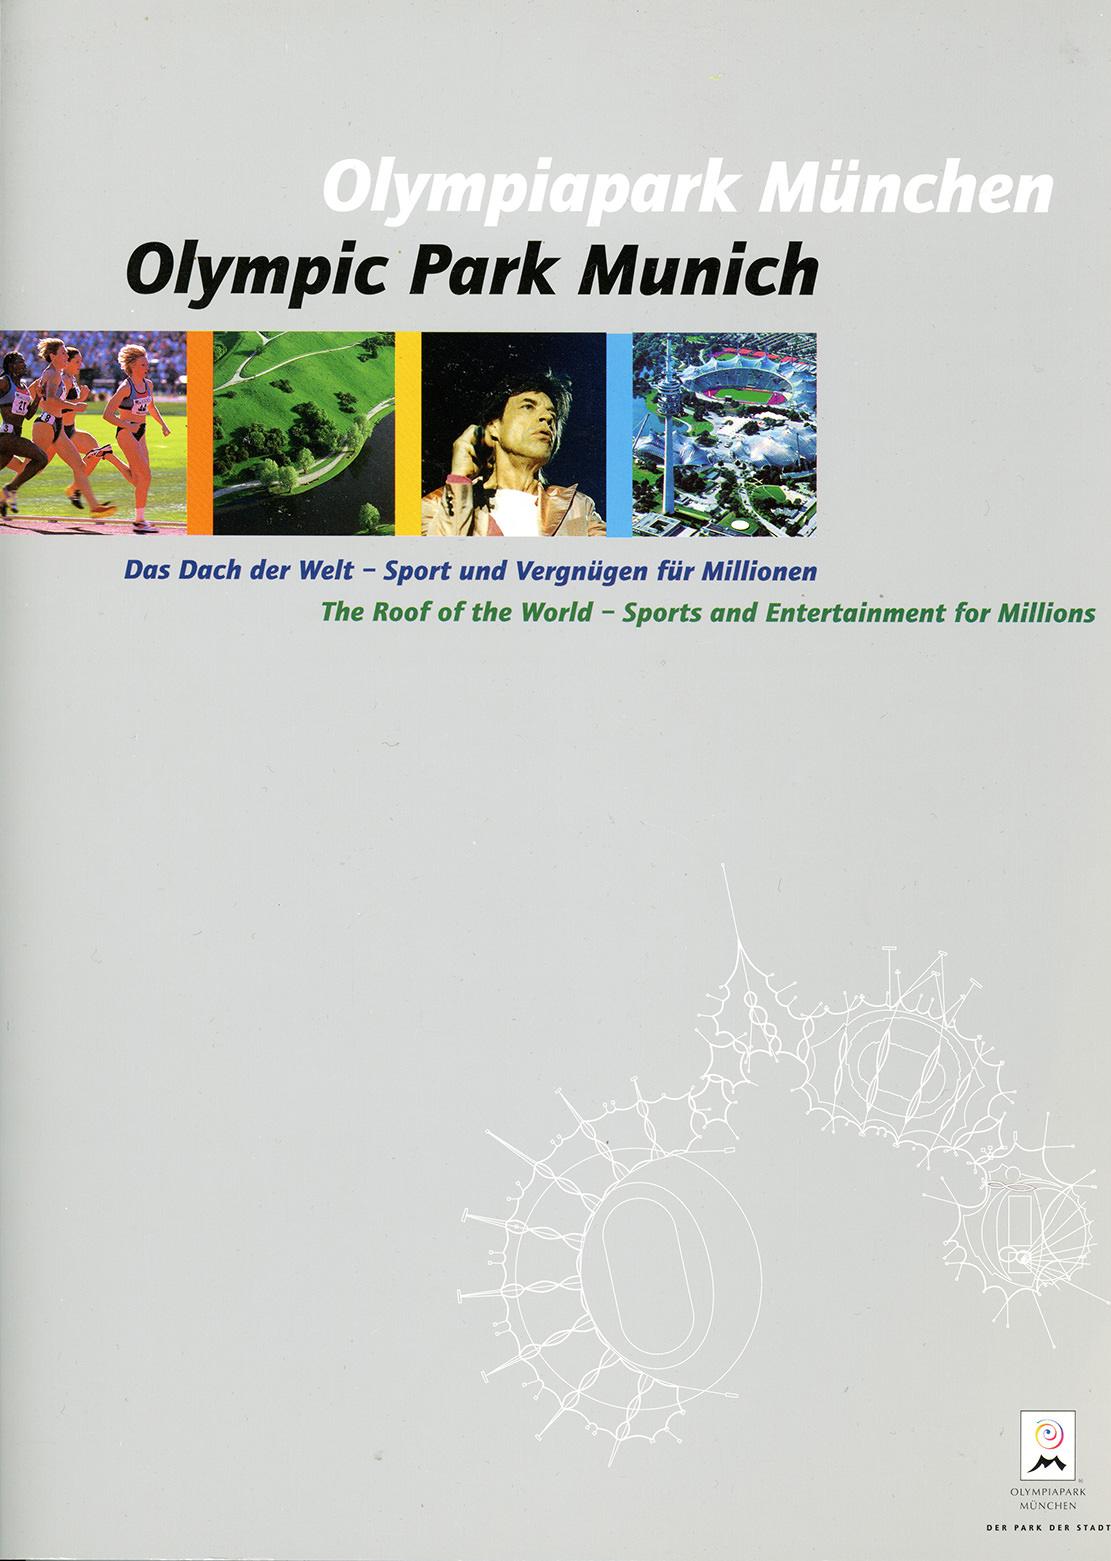 - Olympiapark München